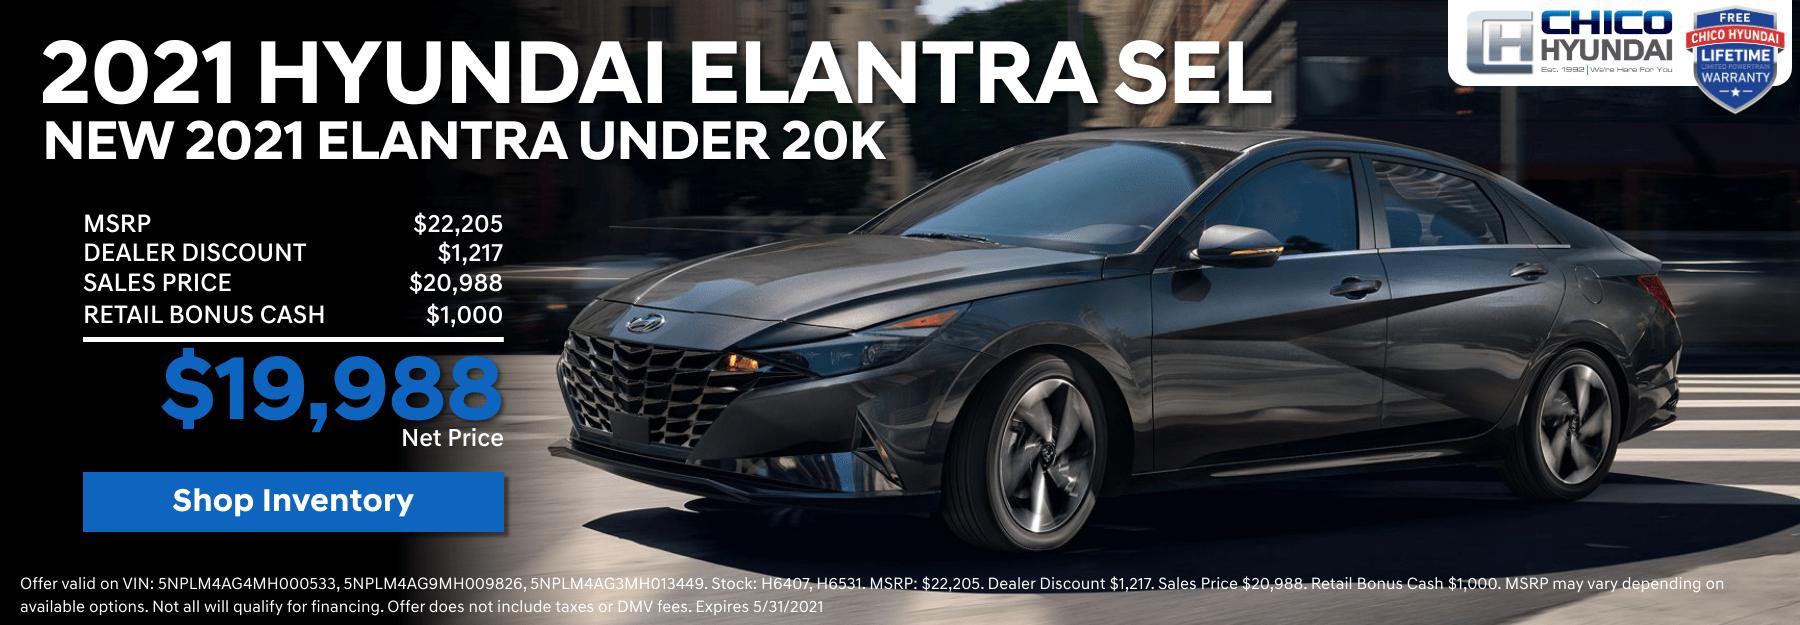 Elantra Discount-1800x625px